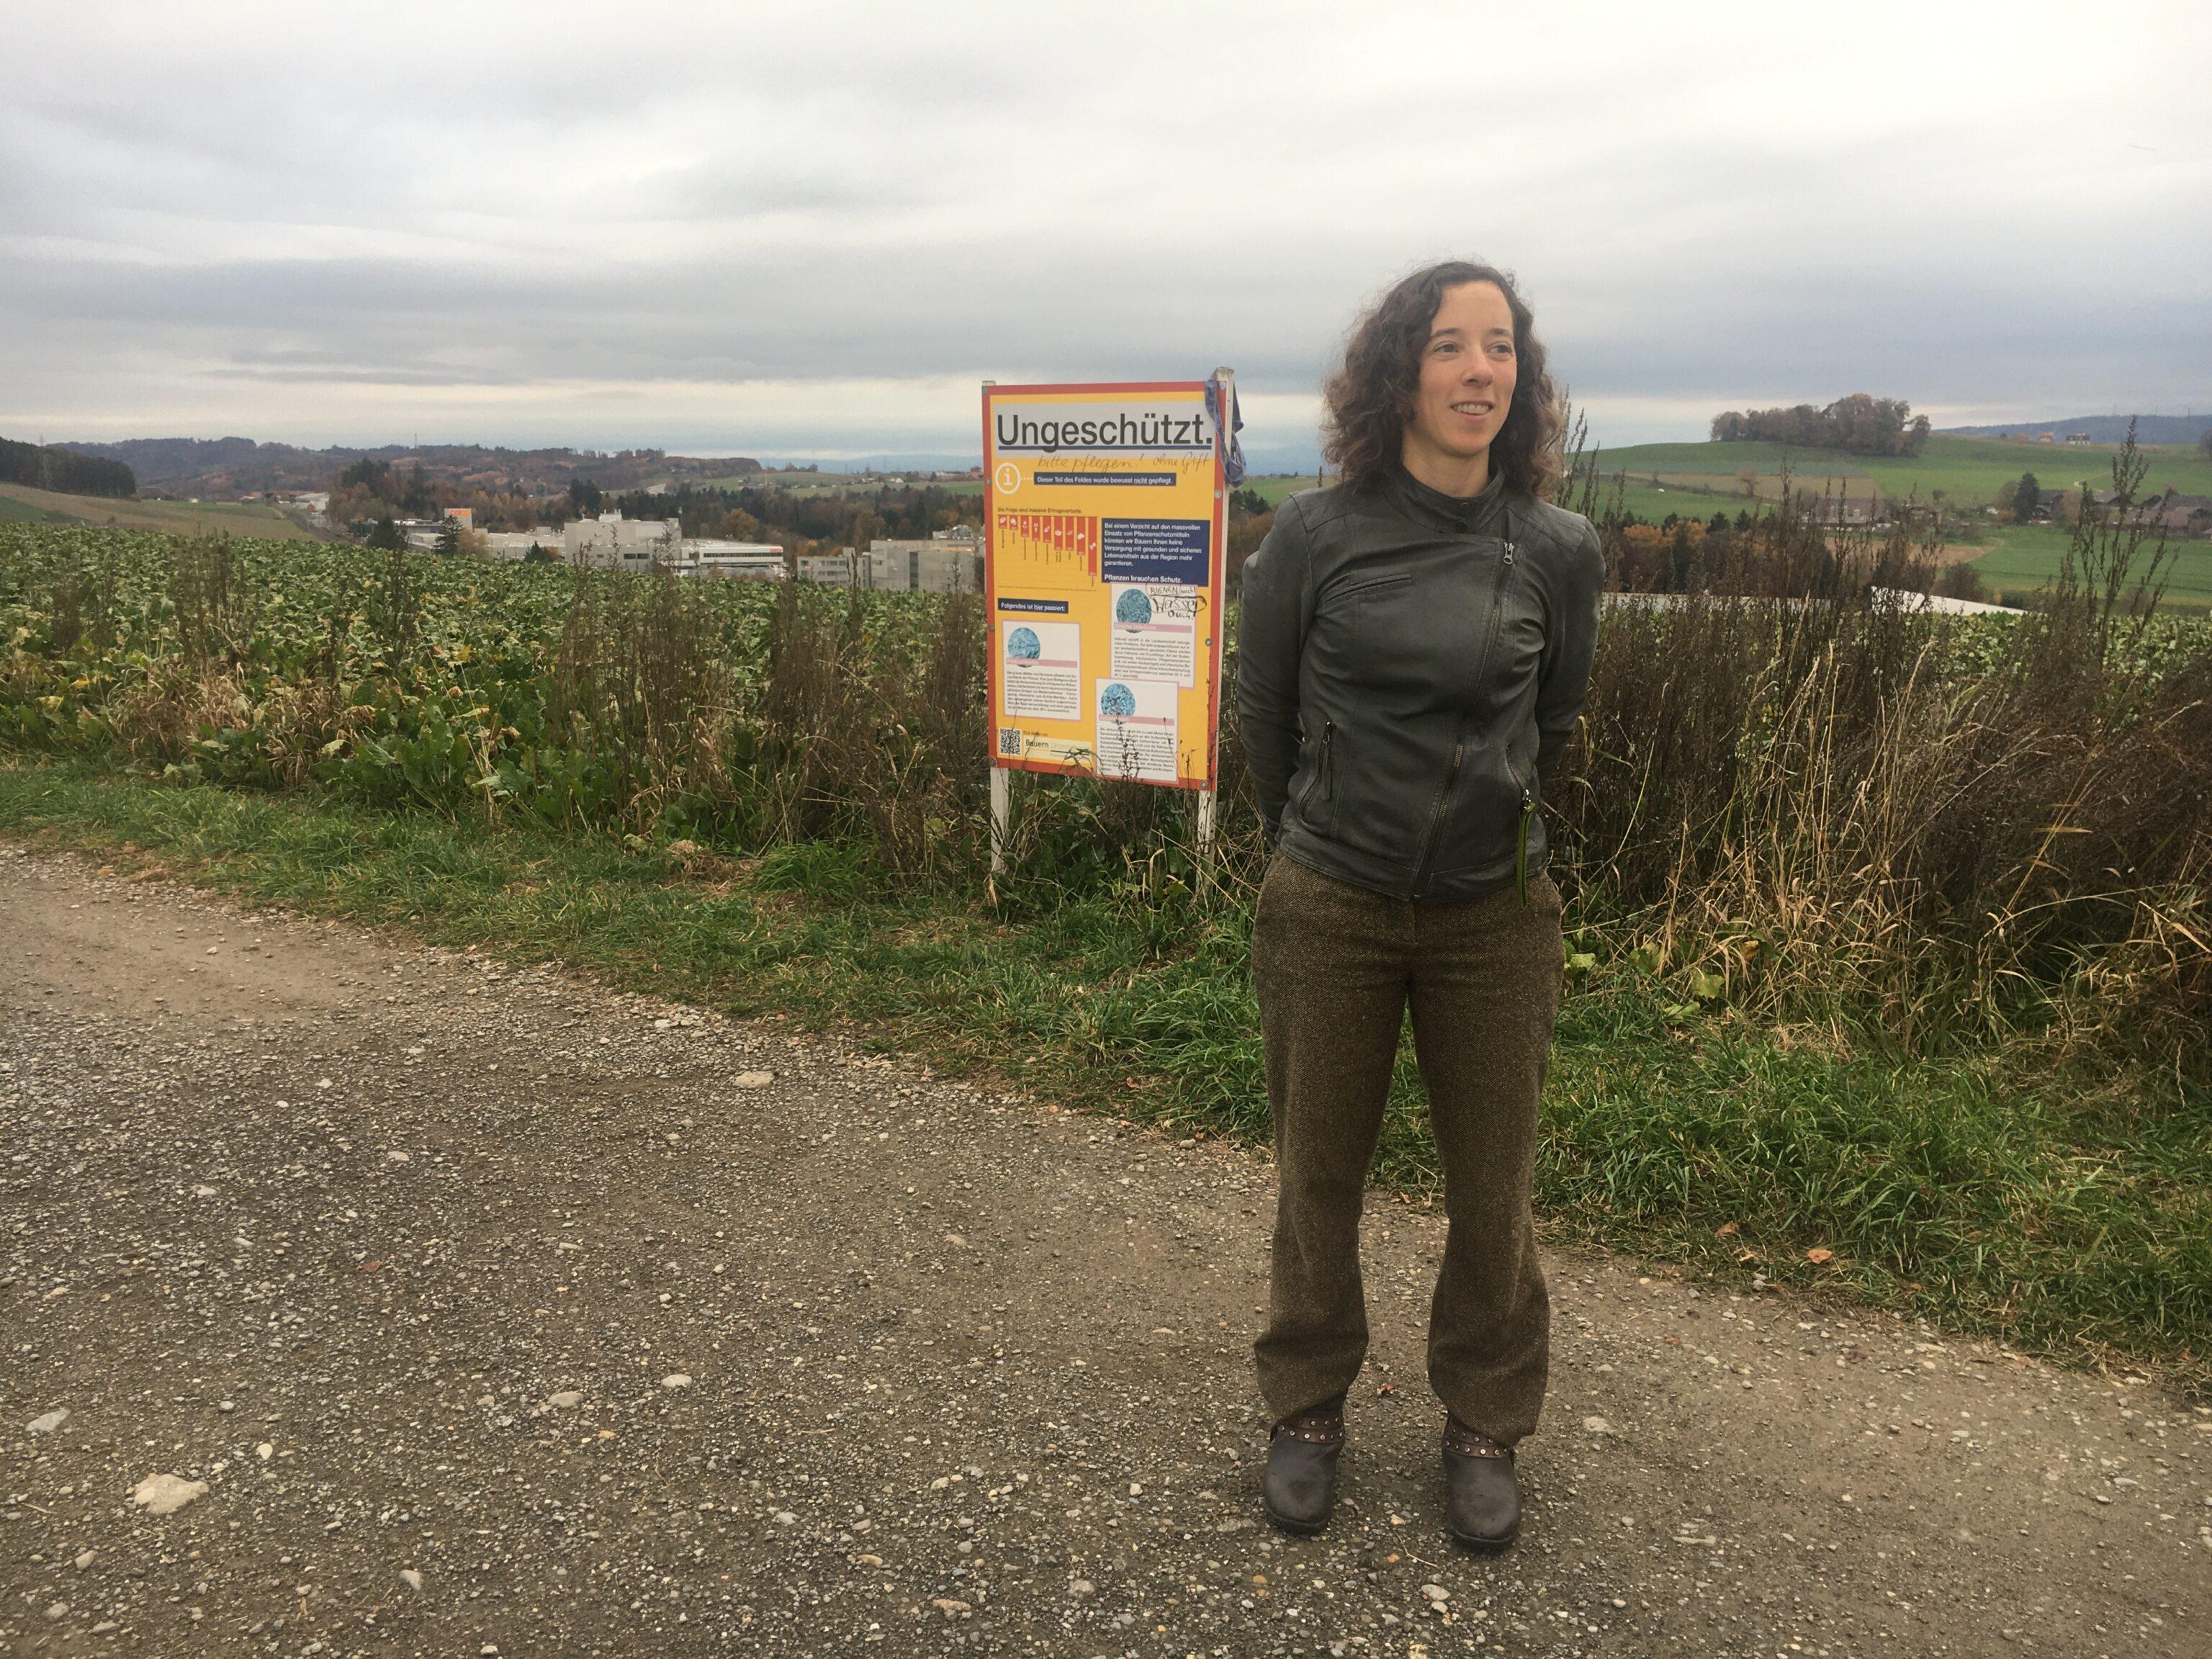 Sarah Rubin vom Grünen Bündnis GB möchte als Stadträtin ins Berner Stadtparlament einziehen